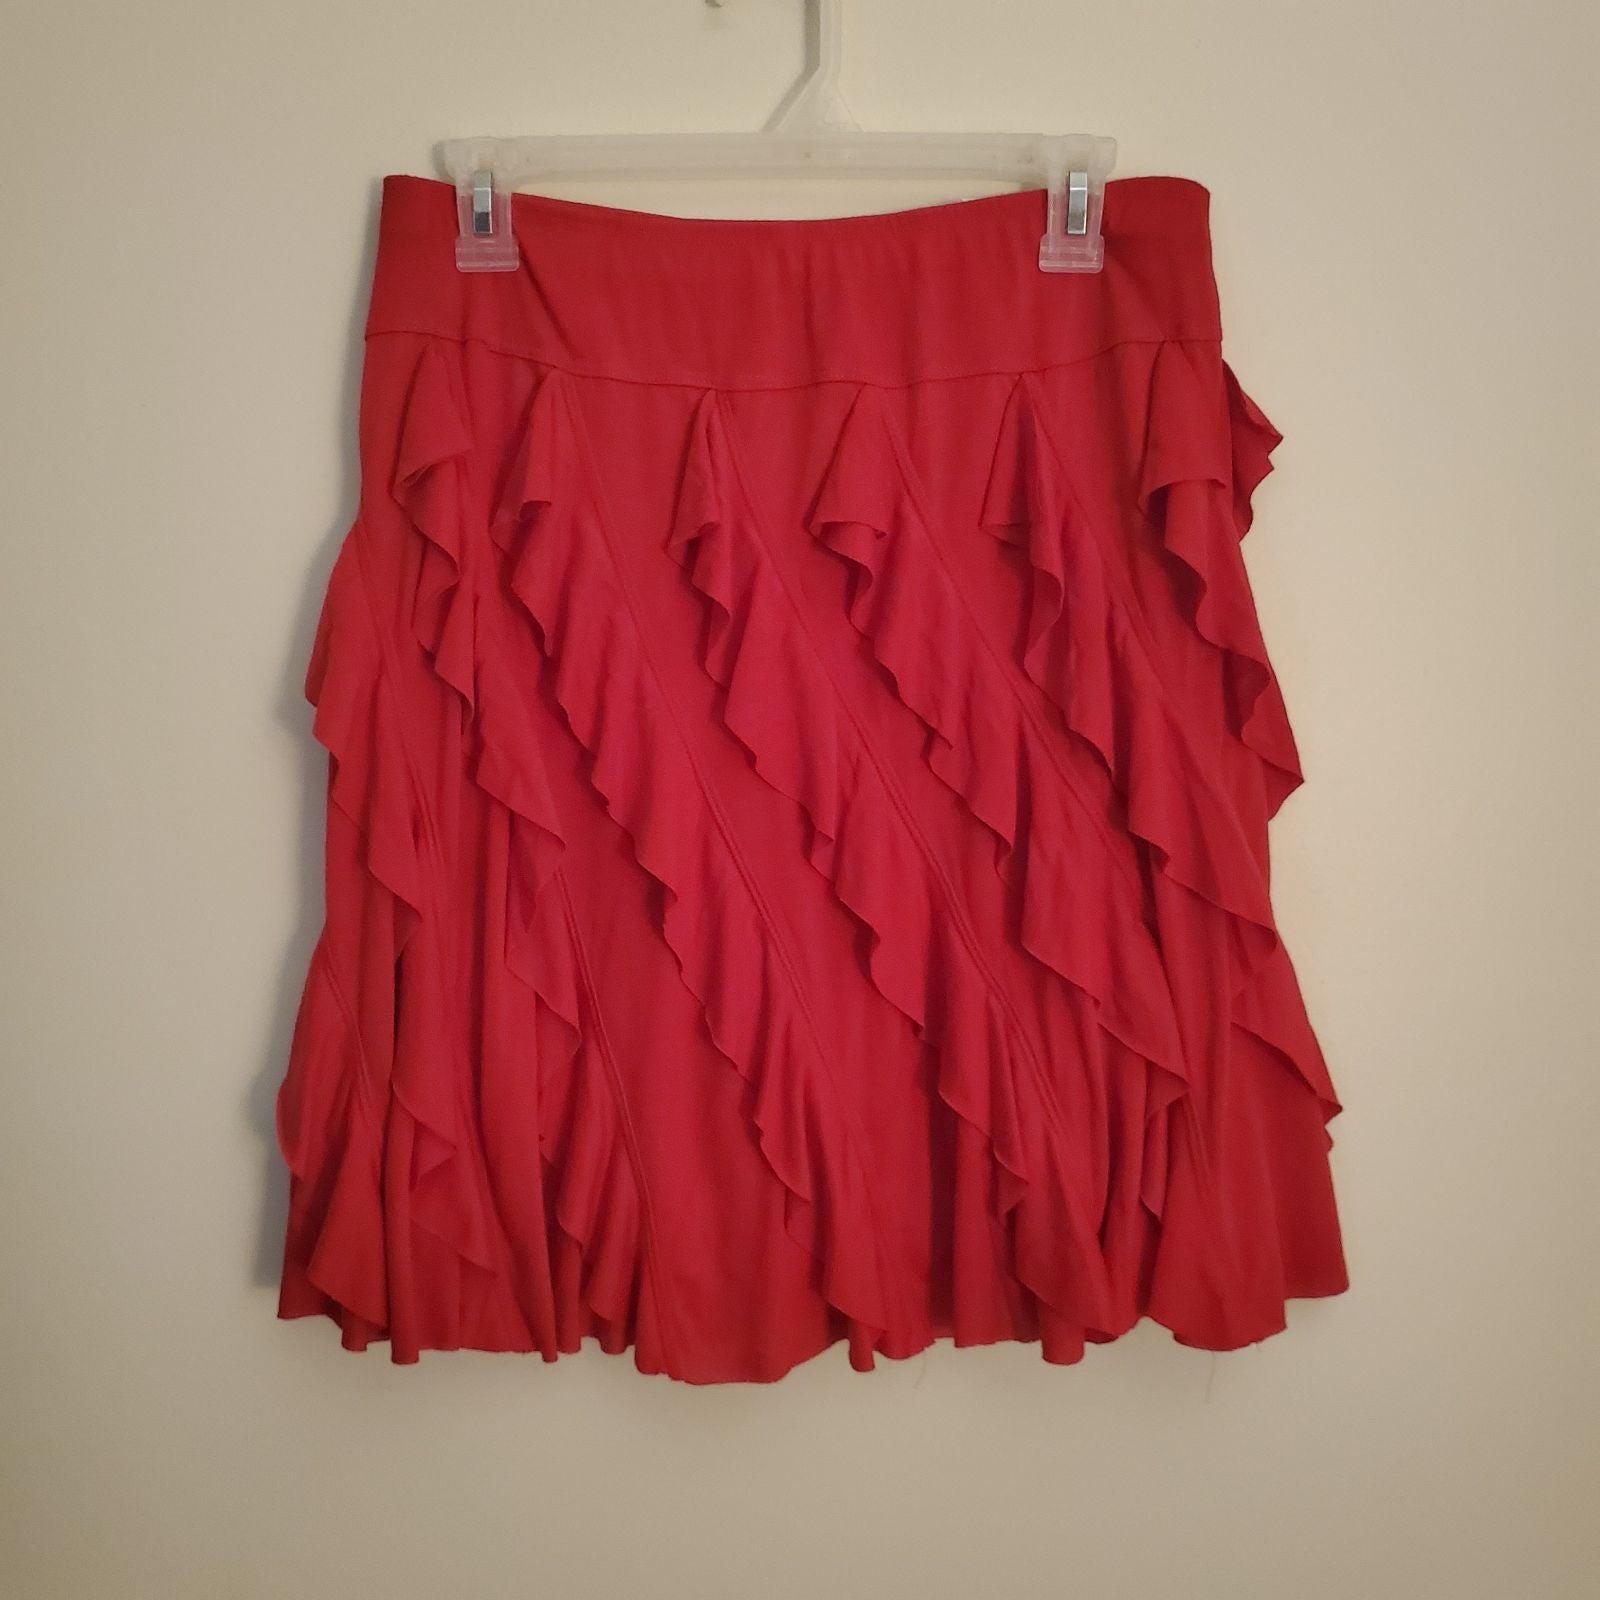 Cato Diagonal Ruffle Stretch Skirt Small